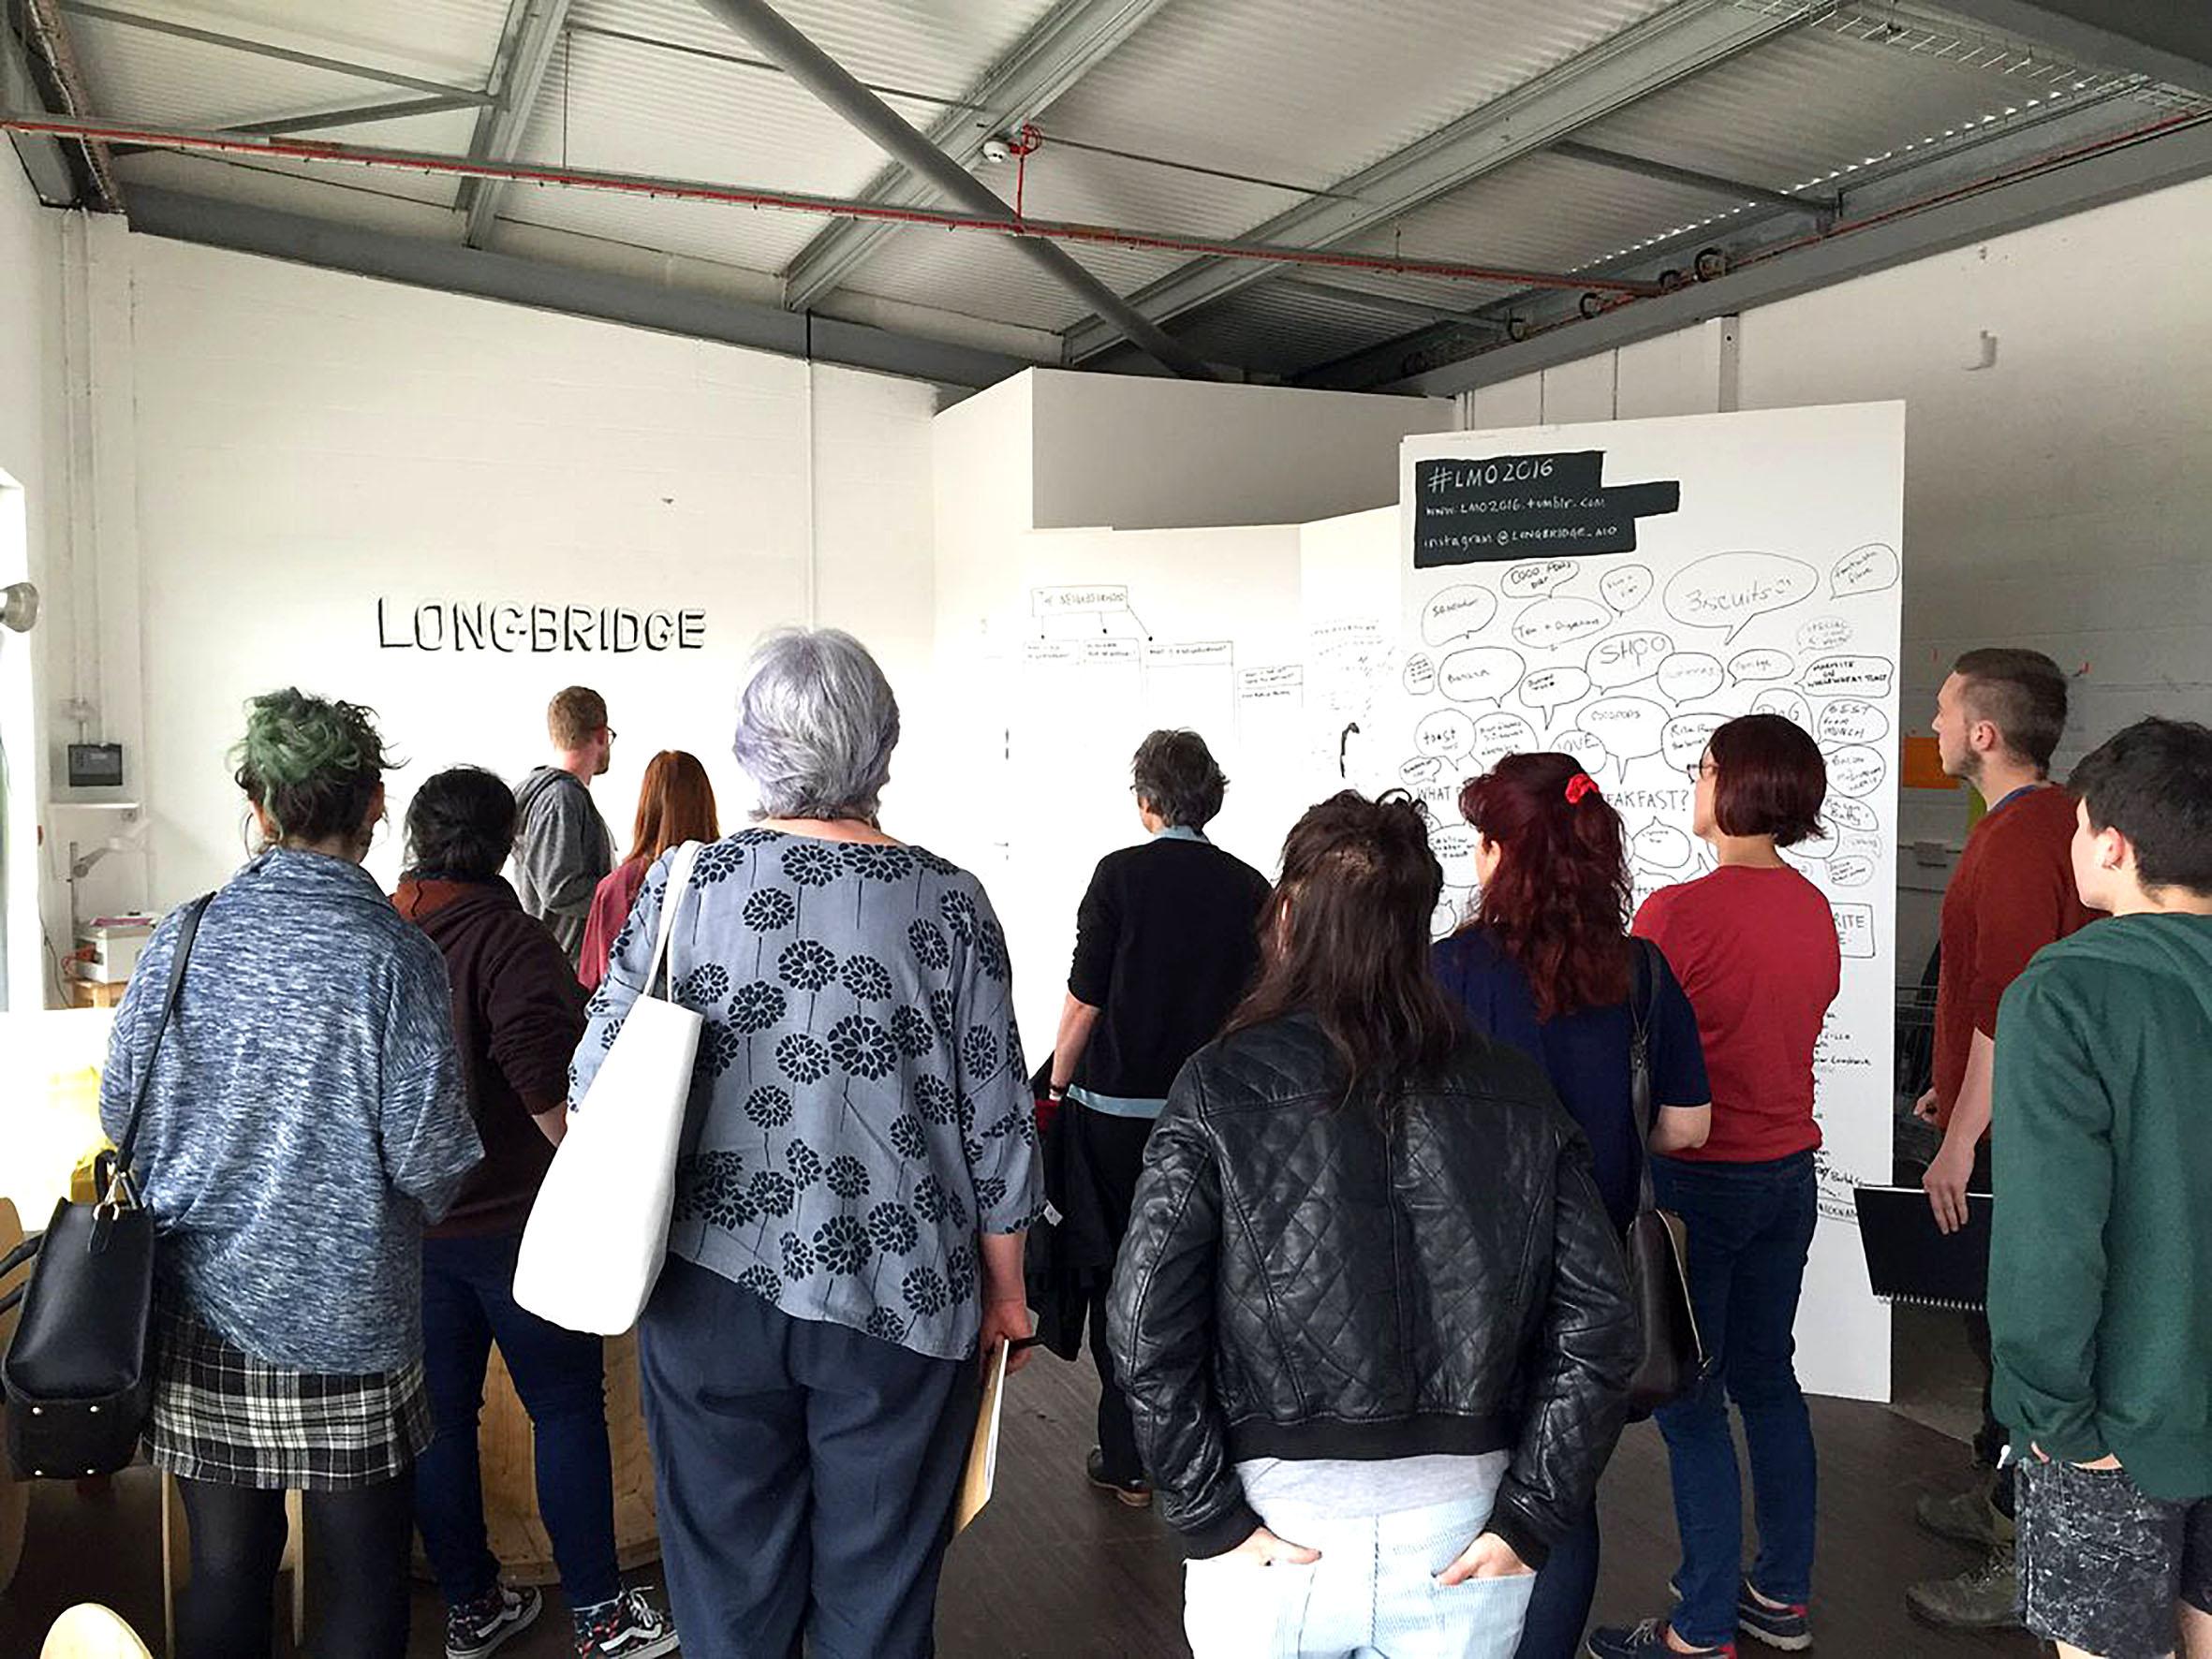 Longbridge Public Art Project talk by Matt Andrews